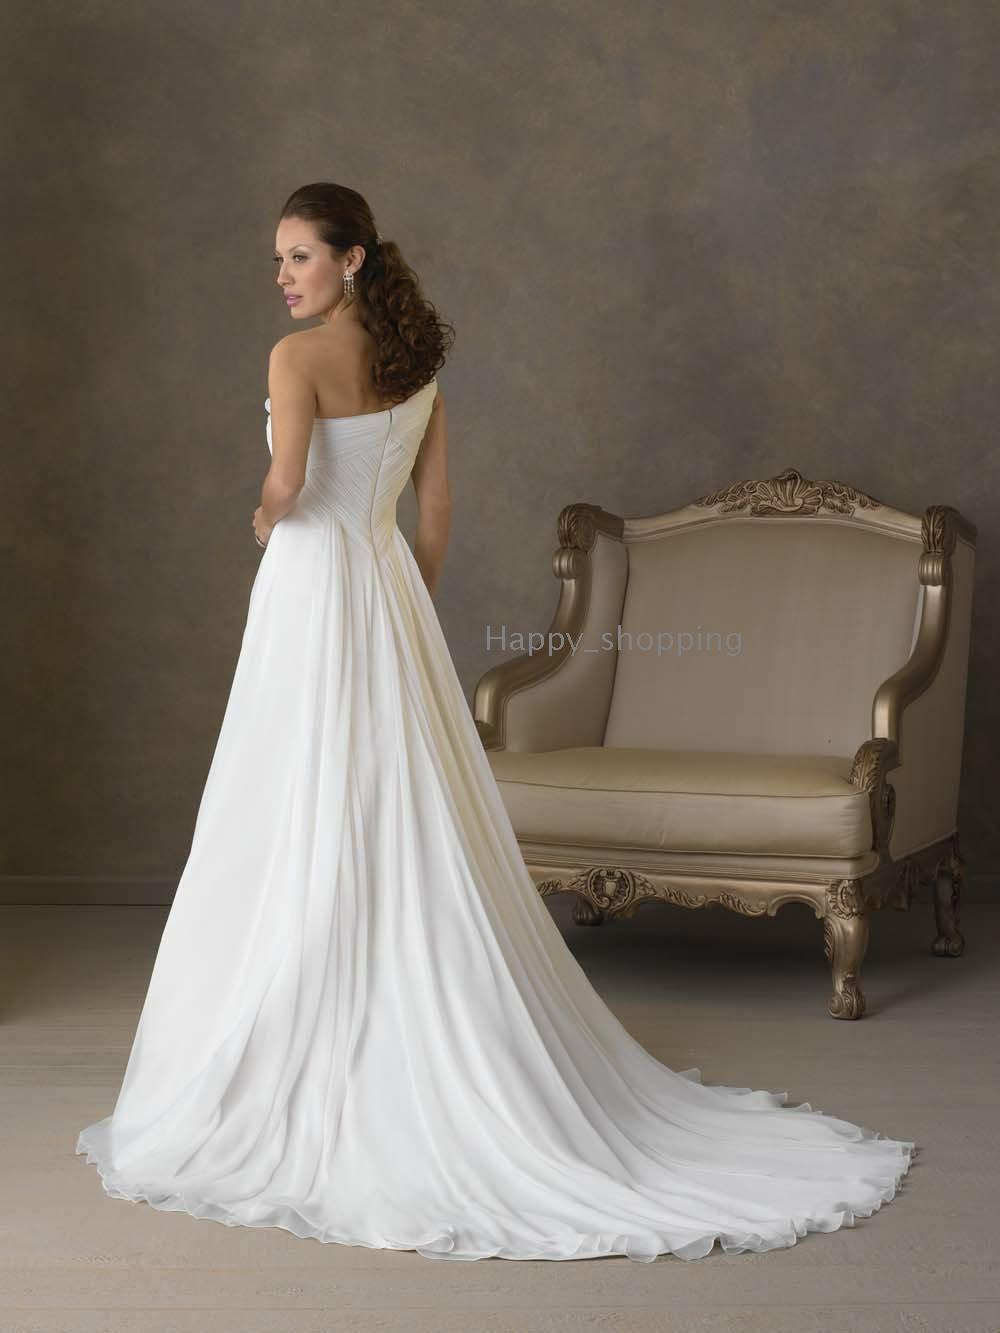 Perfect of bride wedding dresses dance dresses wholesale for Best wedding dresses for dancing